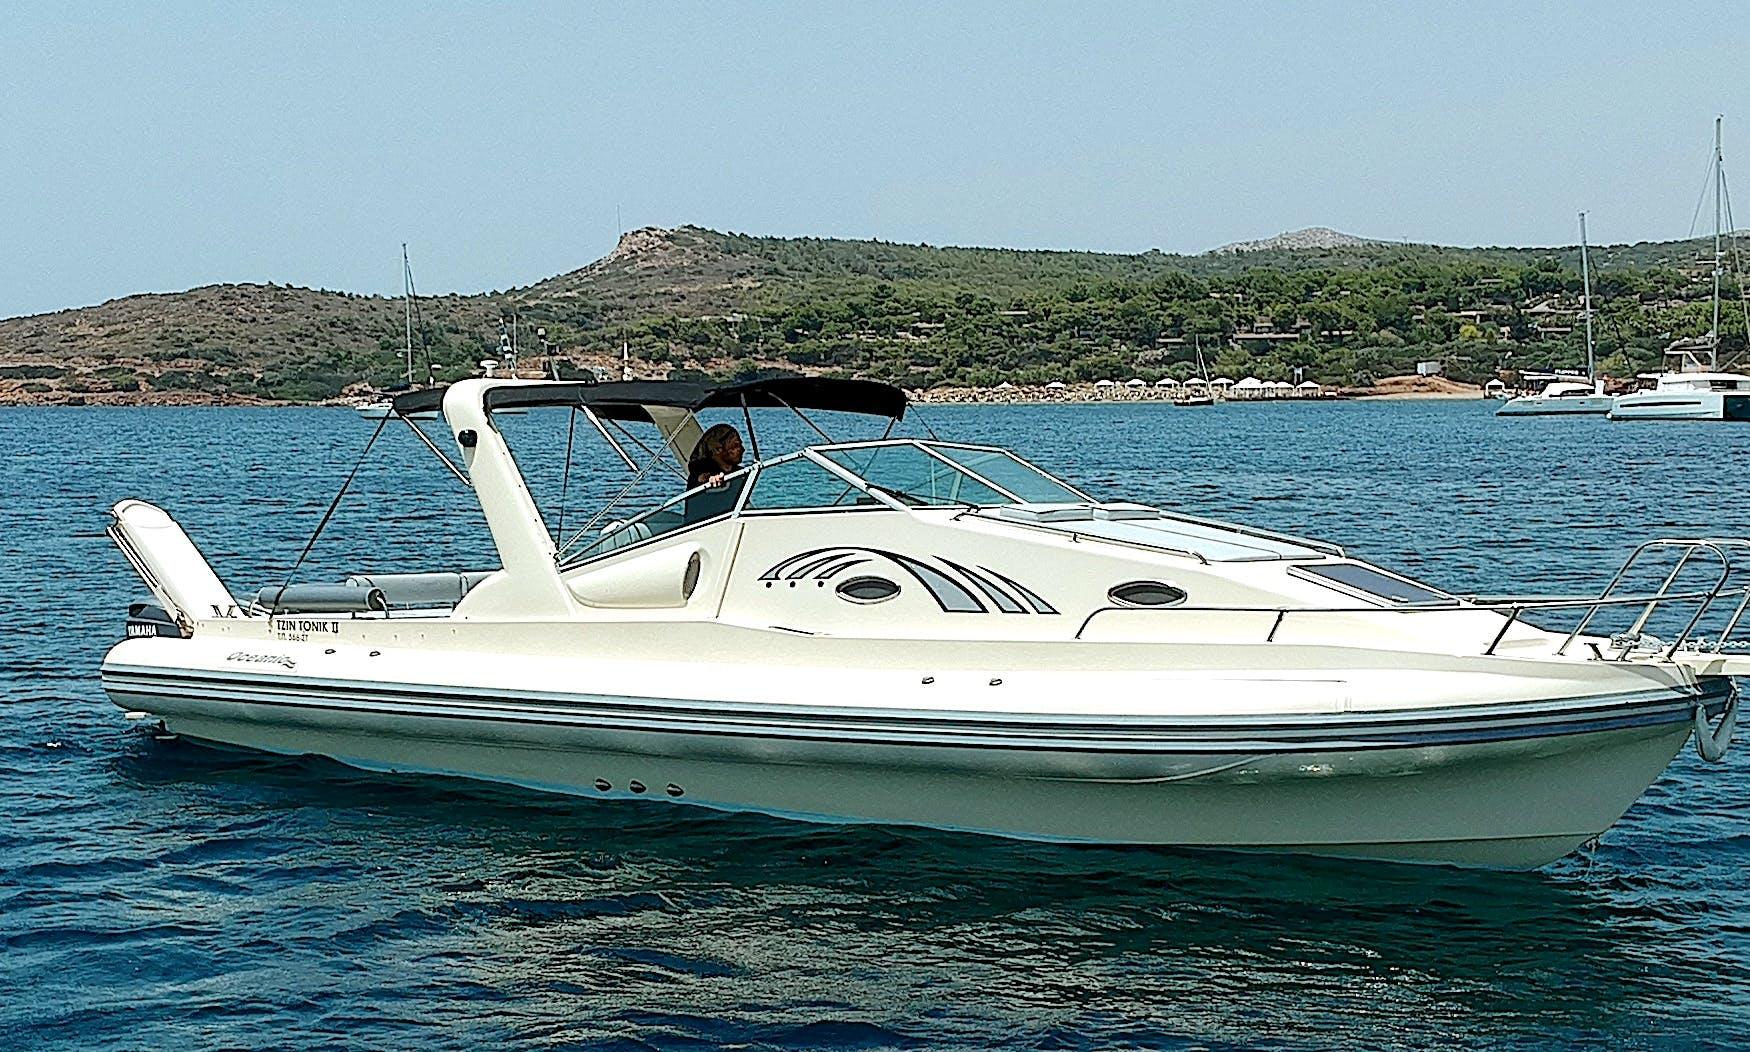 Oceanic Alegria 37ft Speedboat Rental in Porto Heli